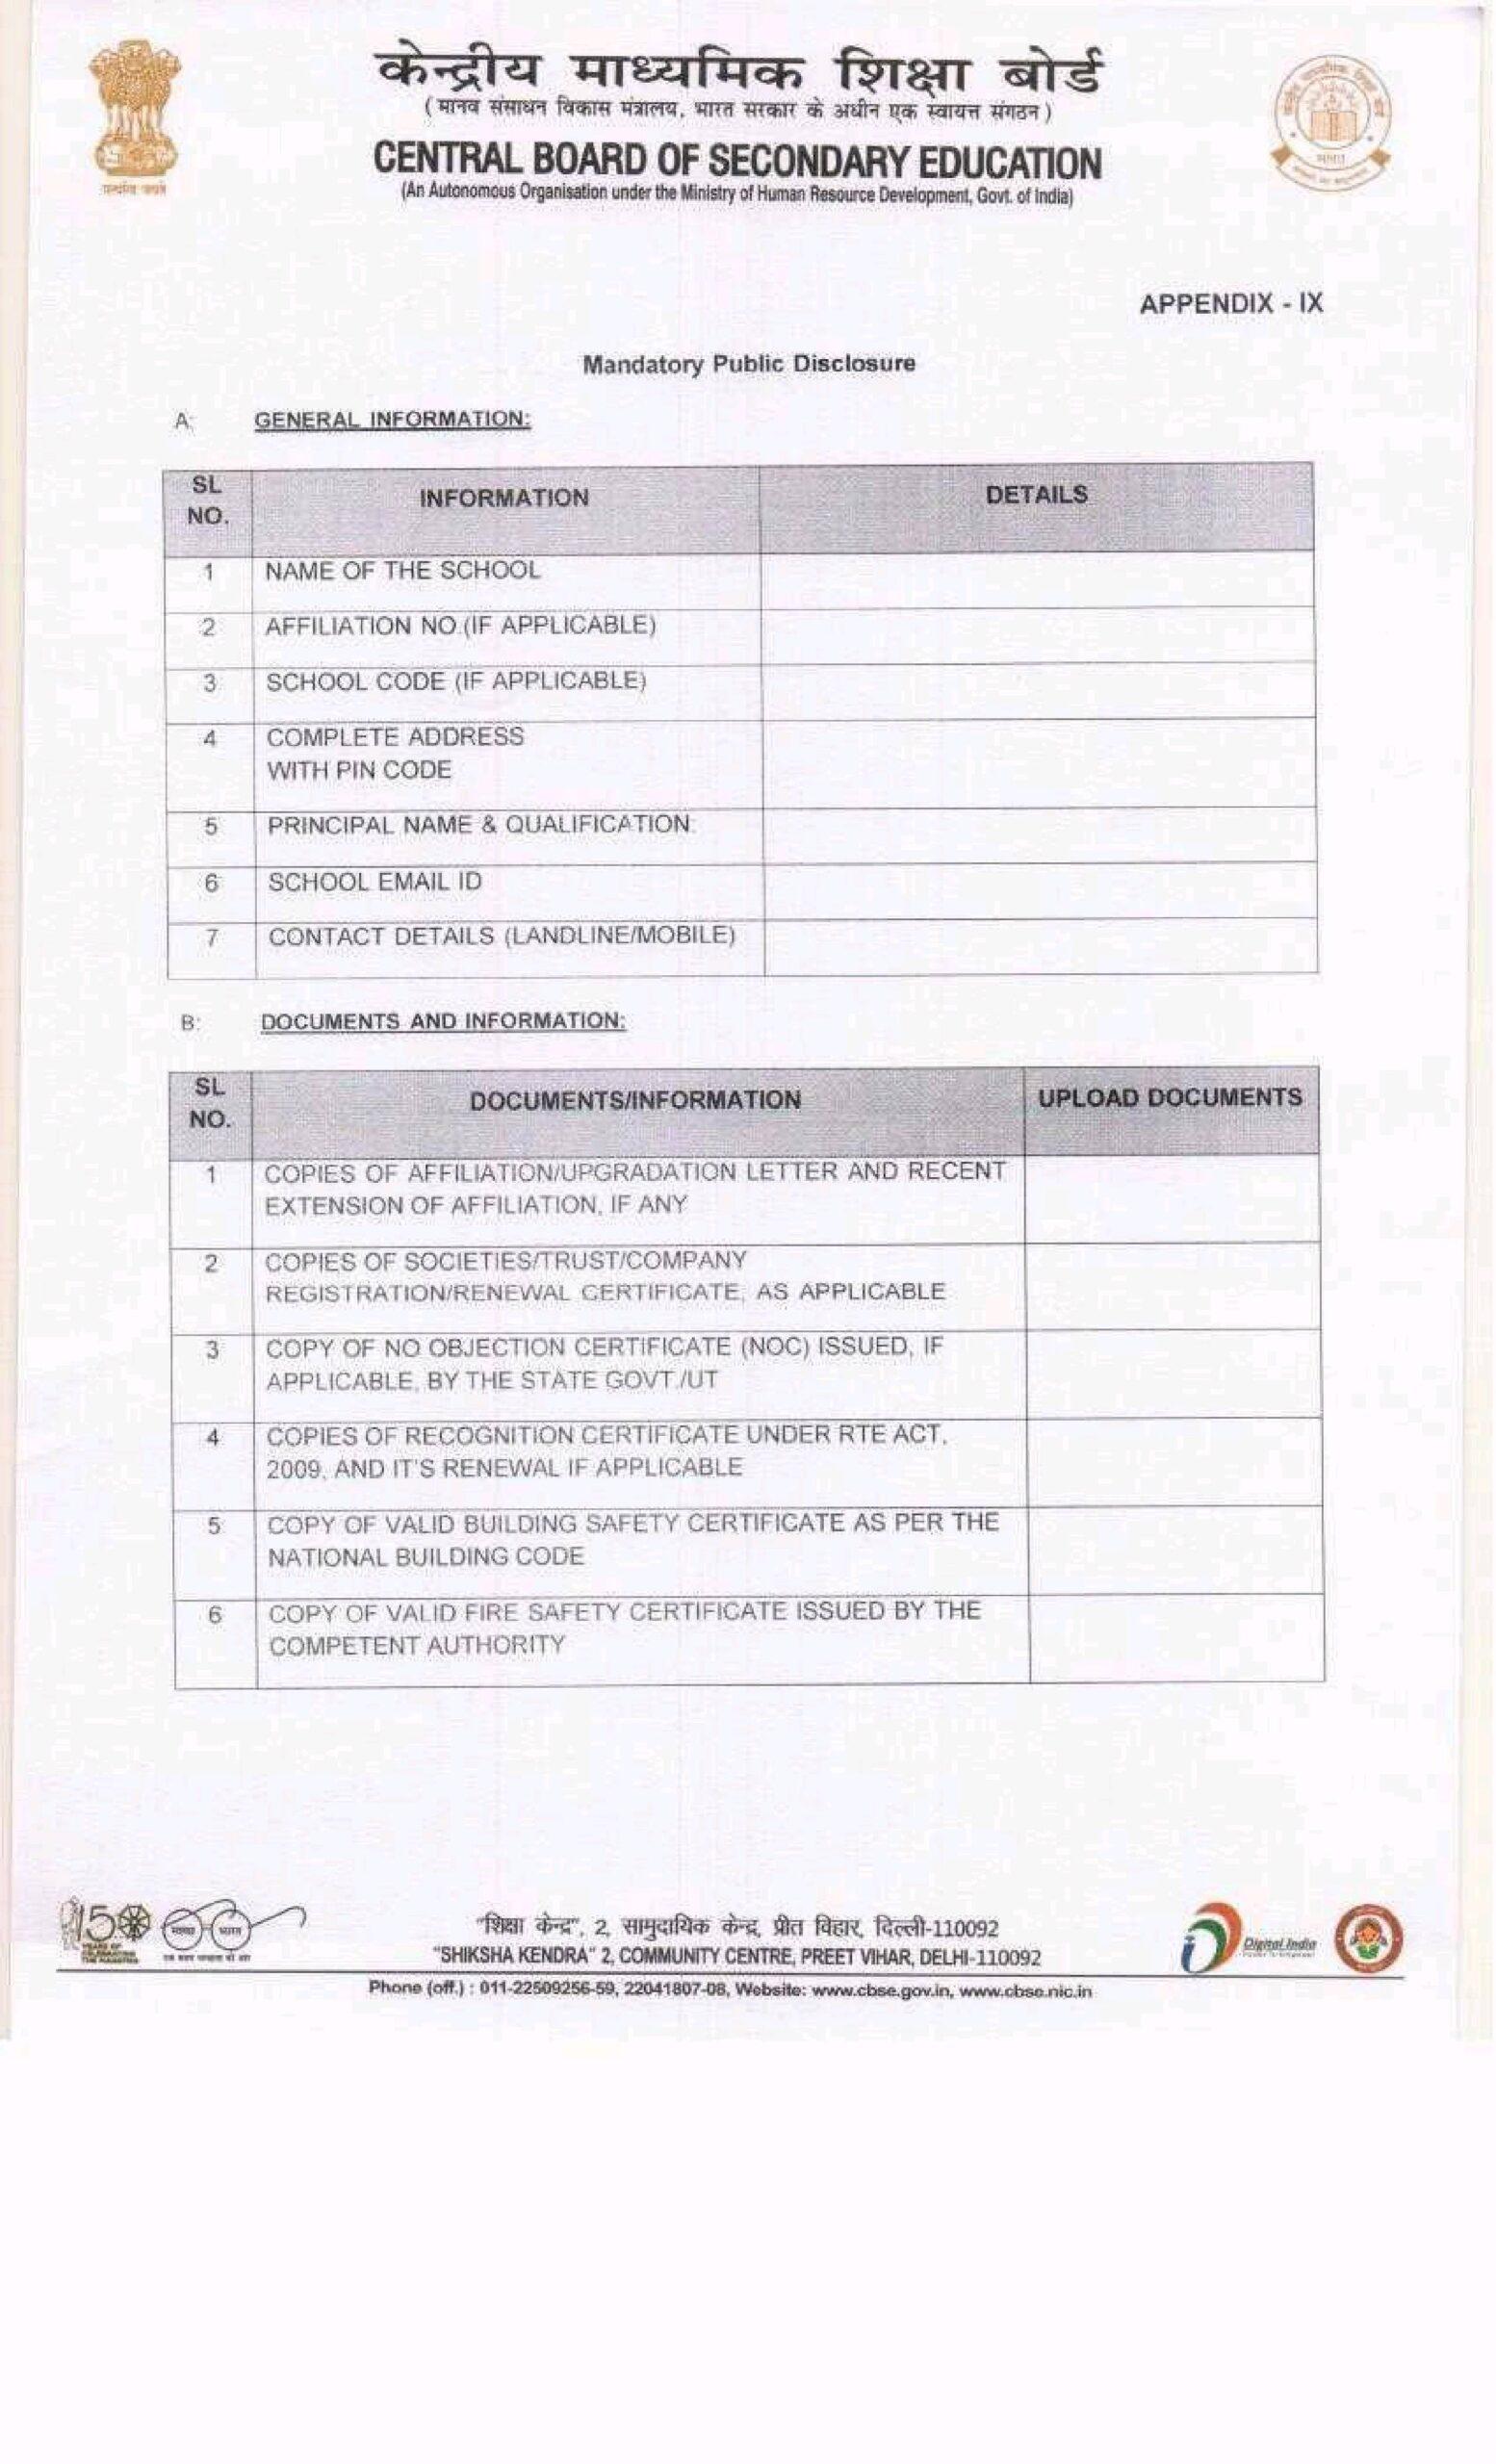 Madatory public disclosure (circular 09)_3